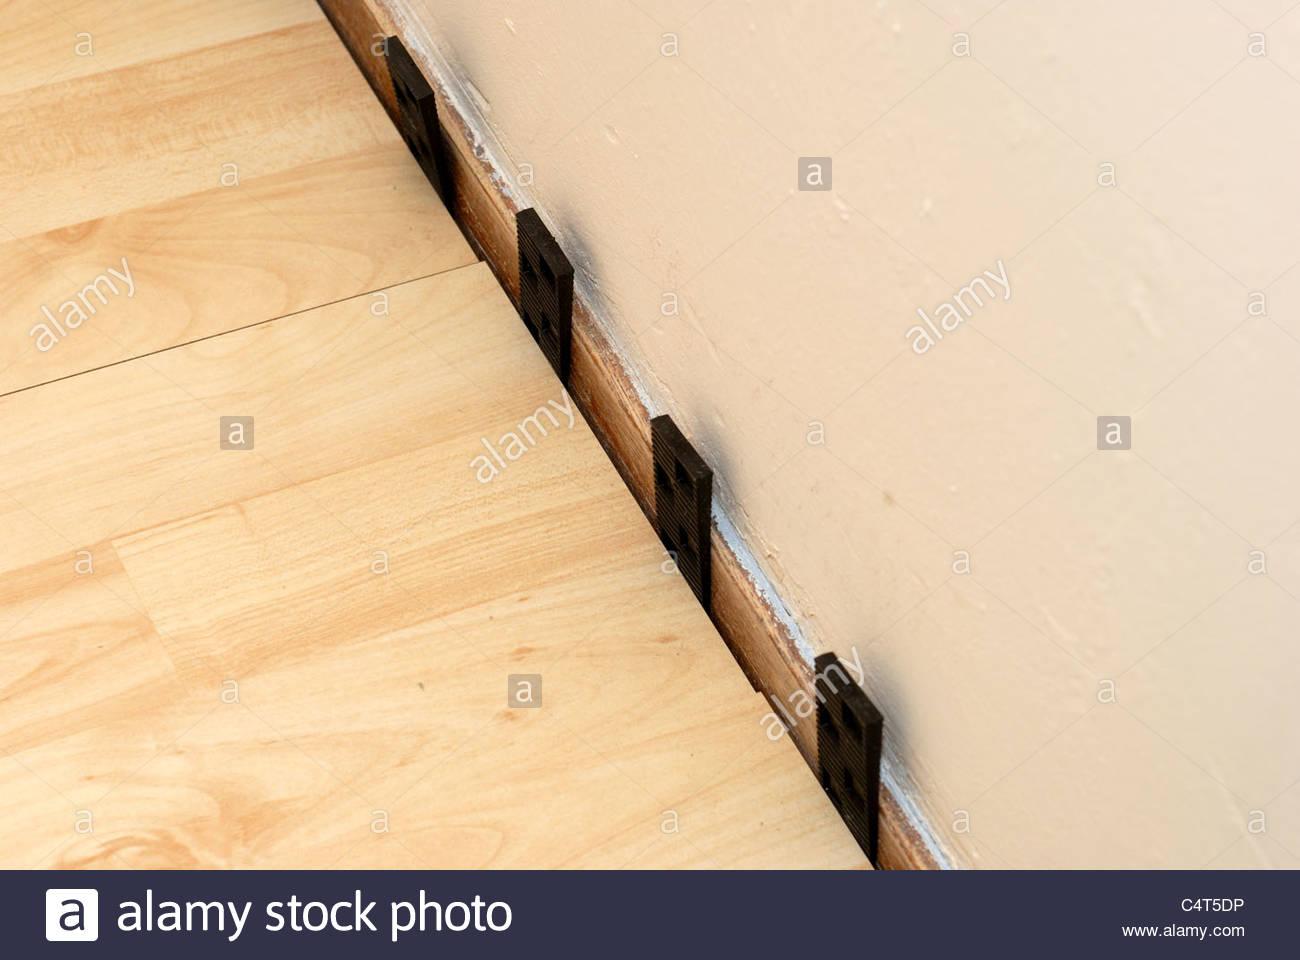 Laying laminate flooring Stock Photo